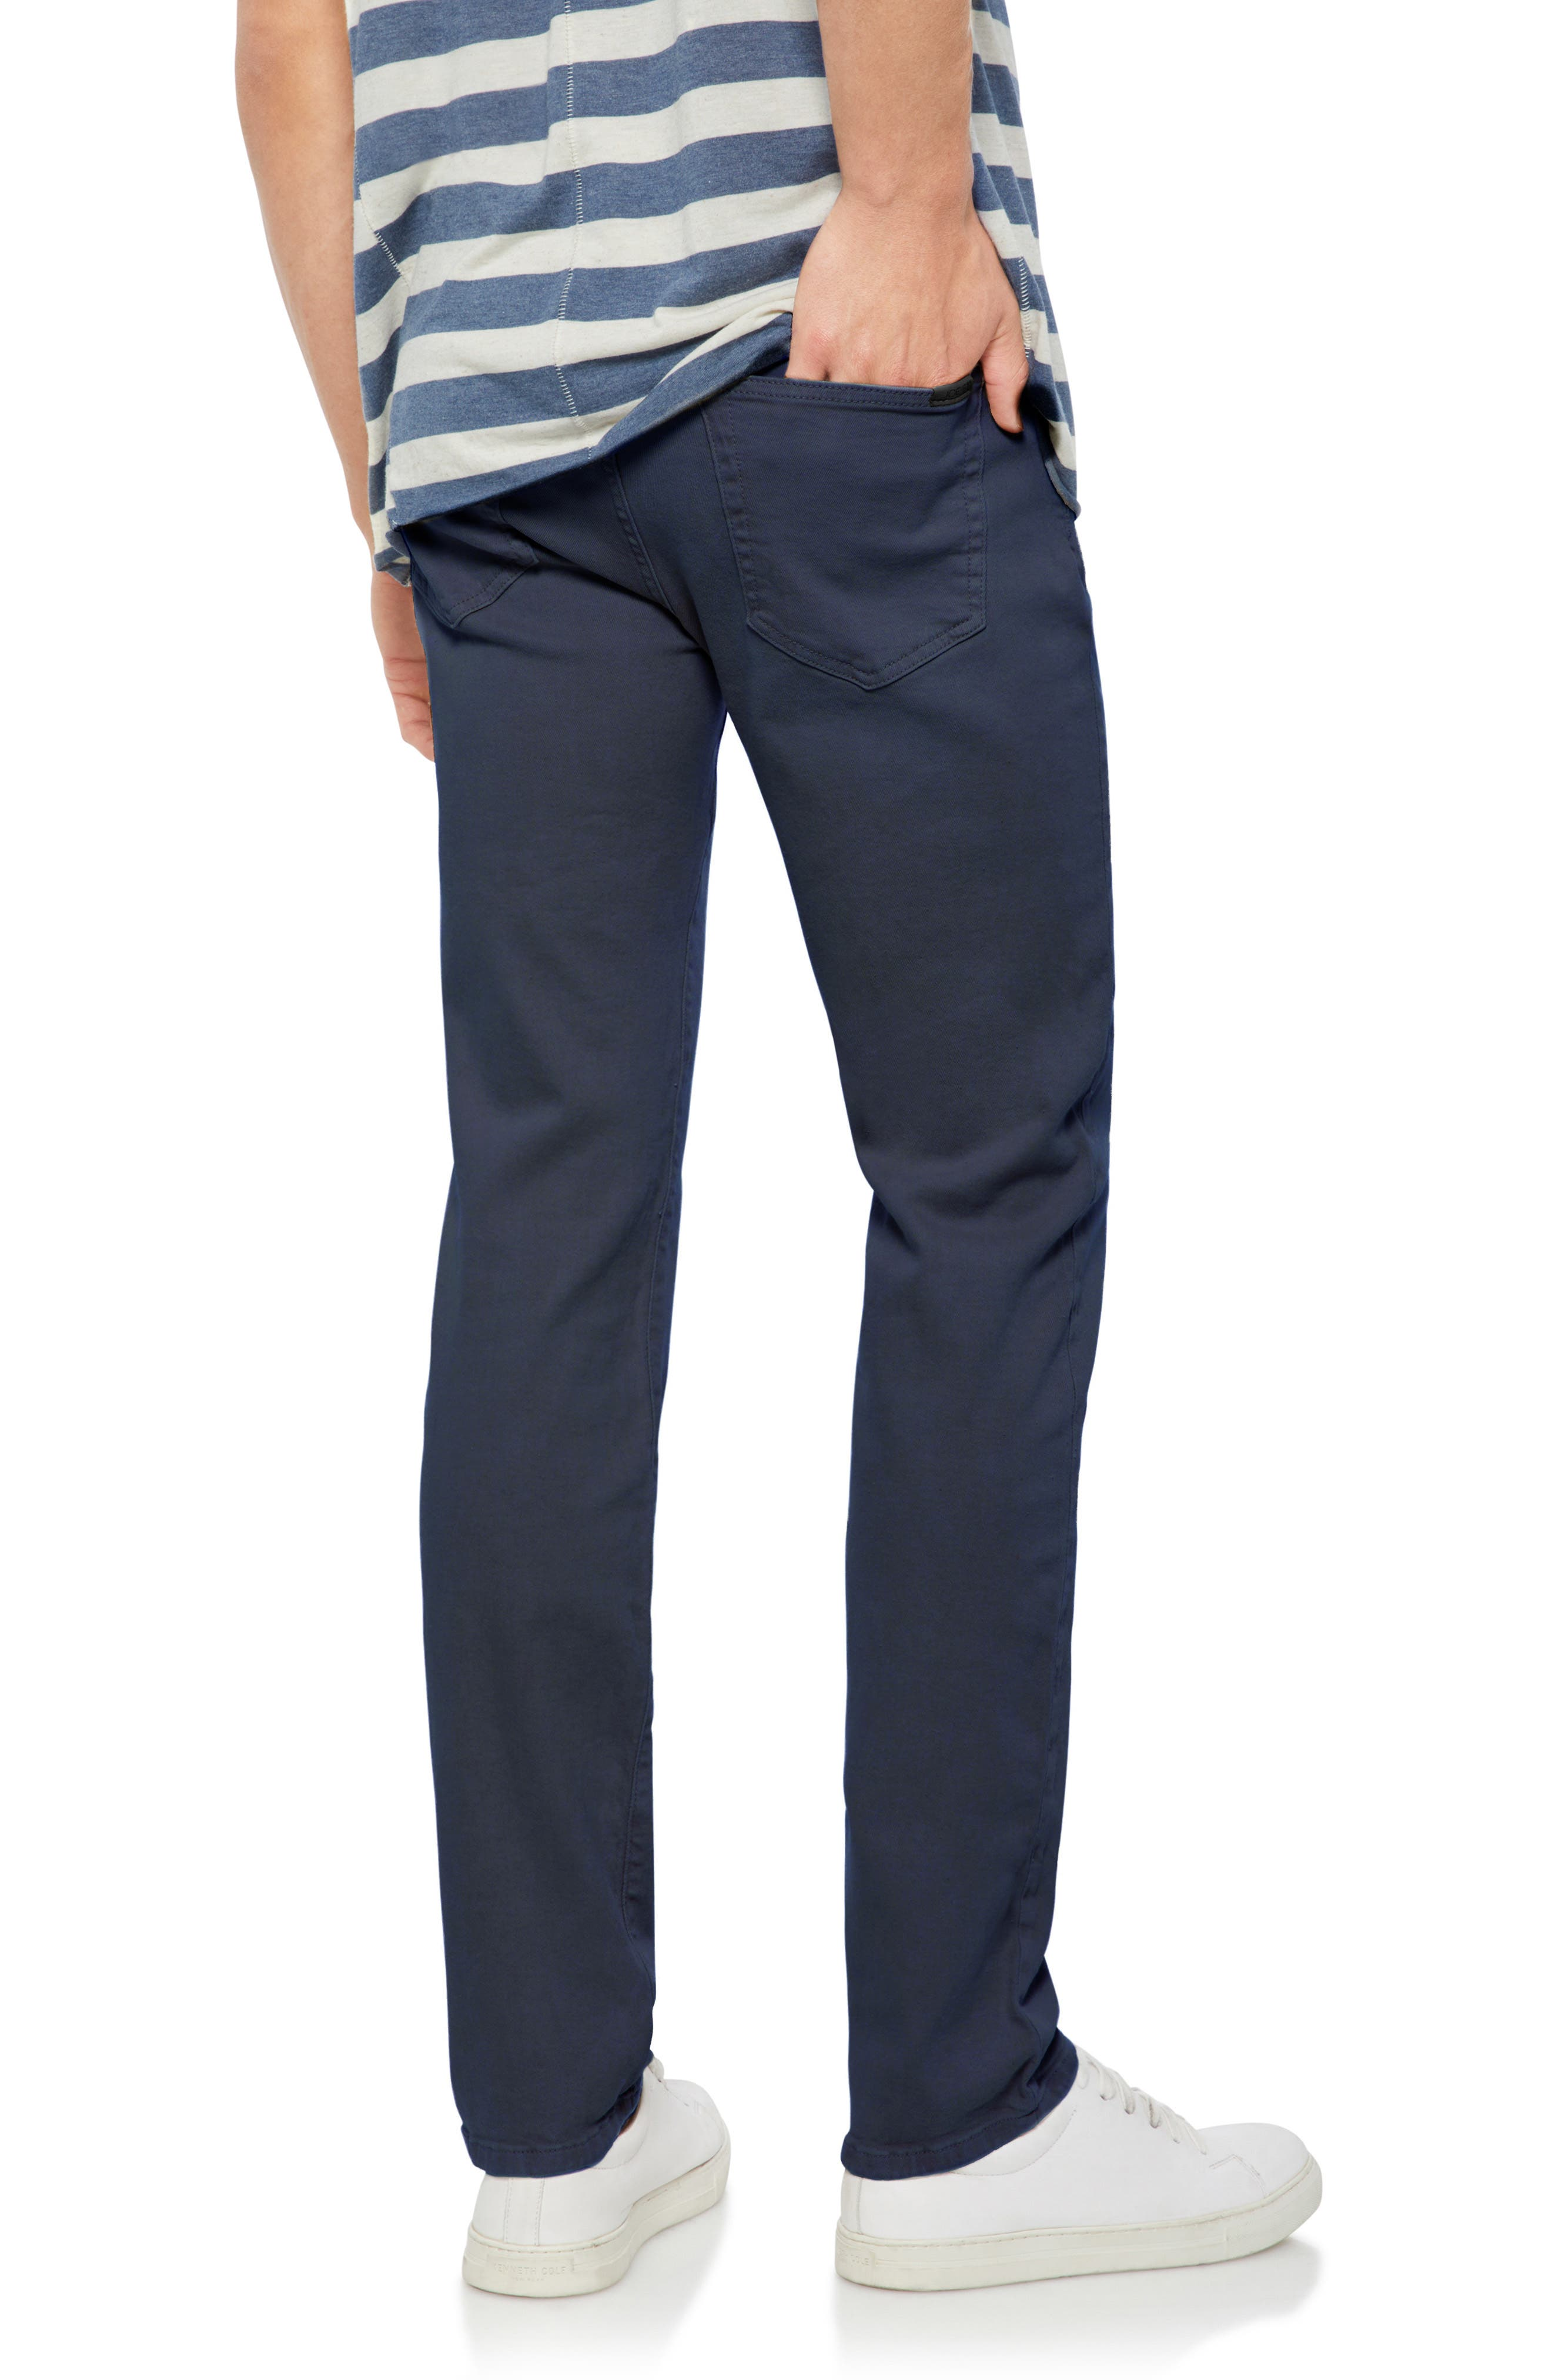 Brixton Slim Straight Fit Pants,                             Alternate thumbnail 2, color,                             NAVY